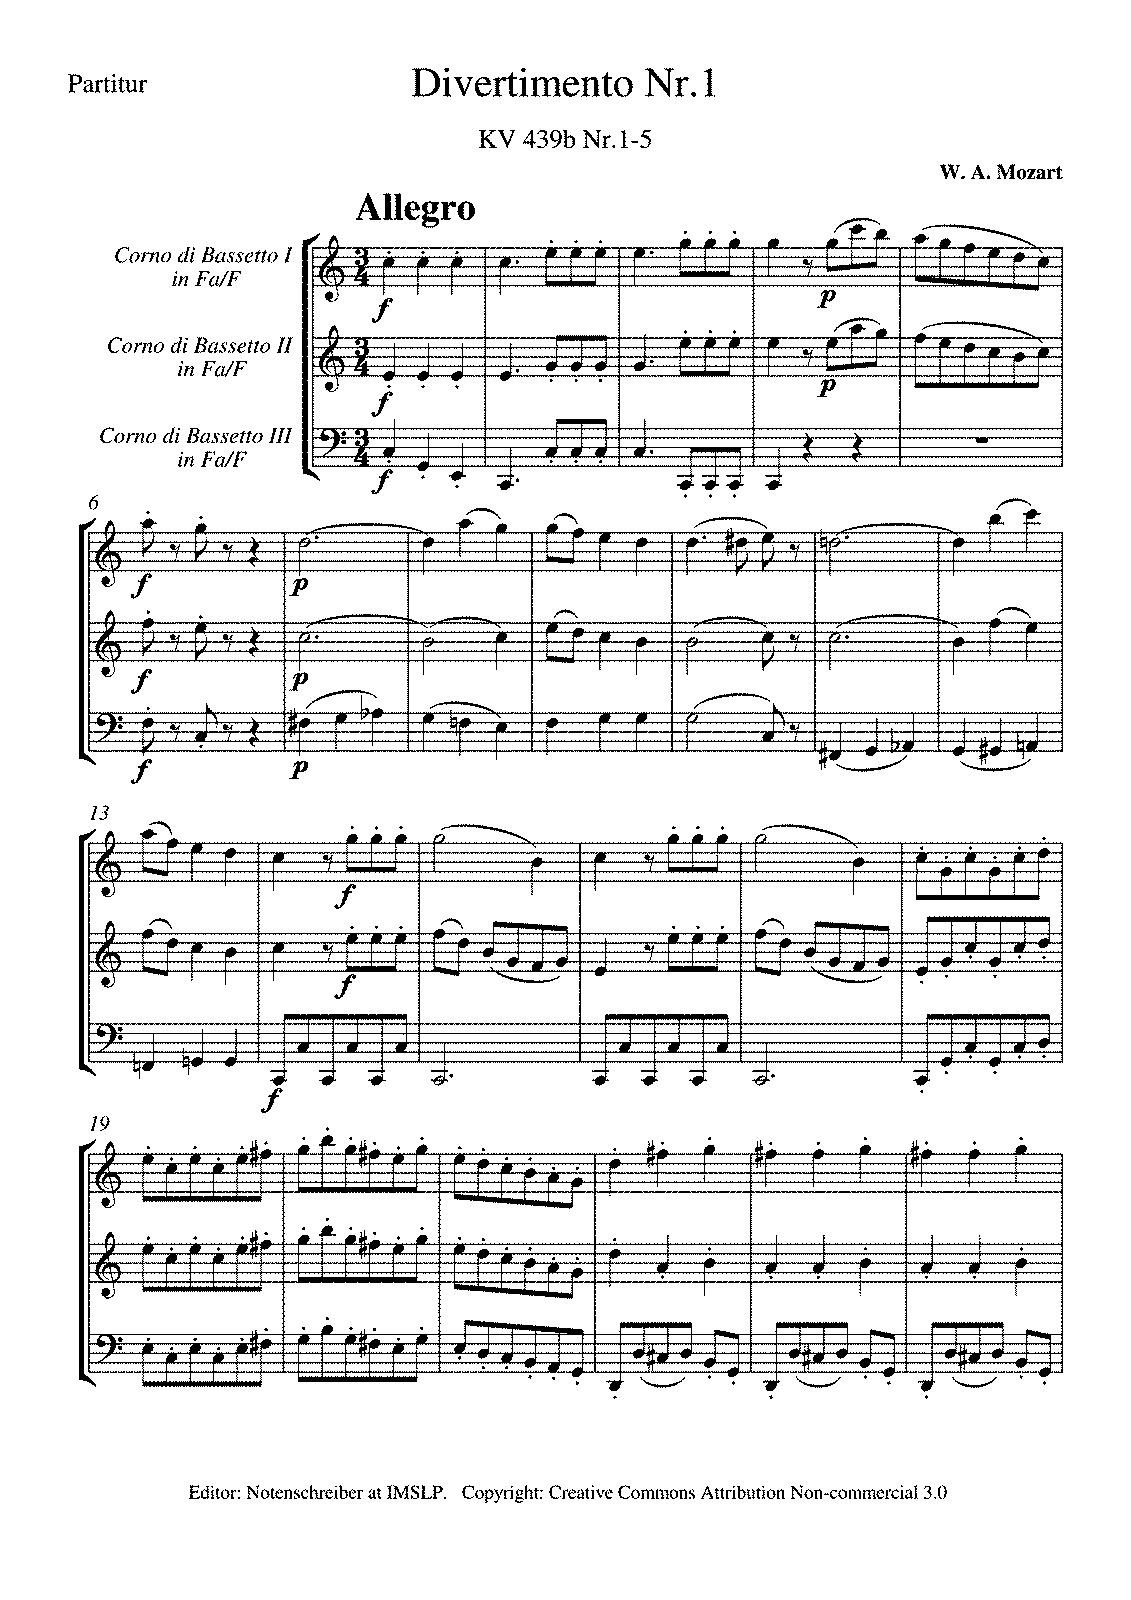 stravinsky symphony in three movements imslp